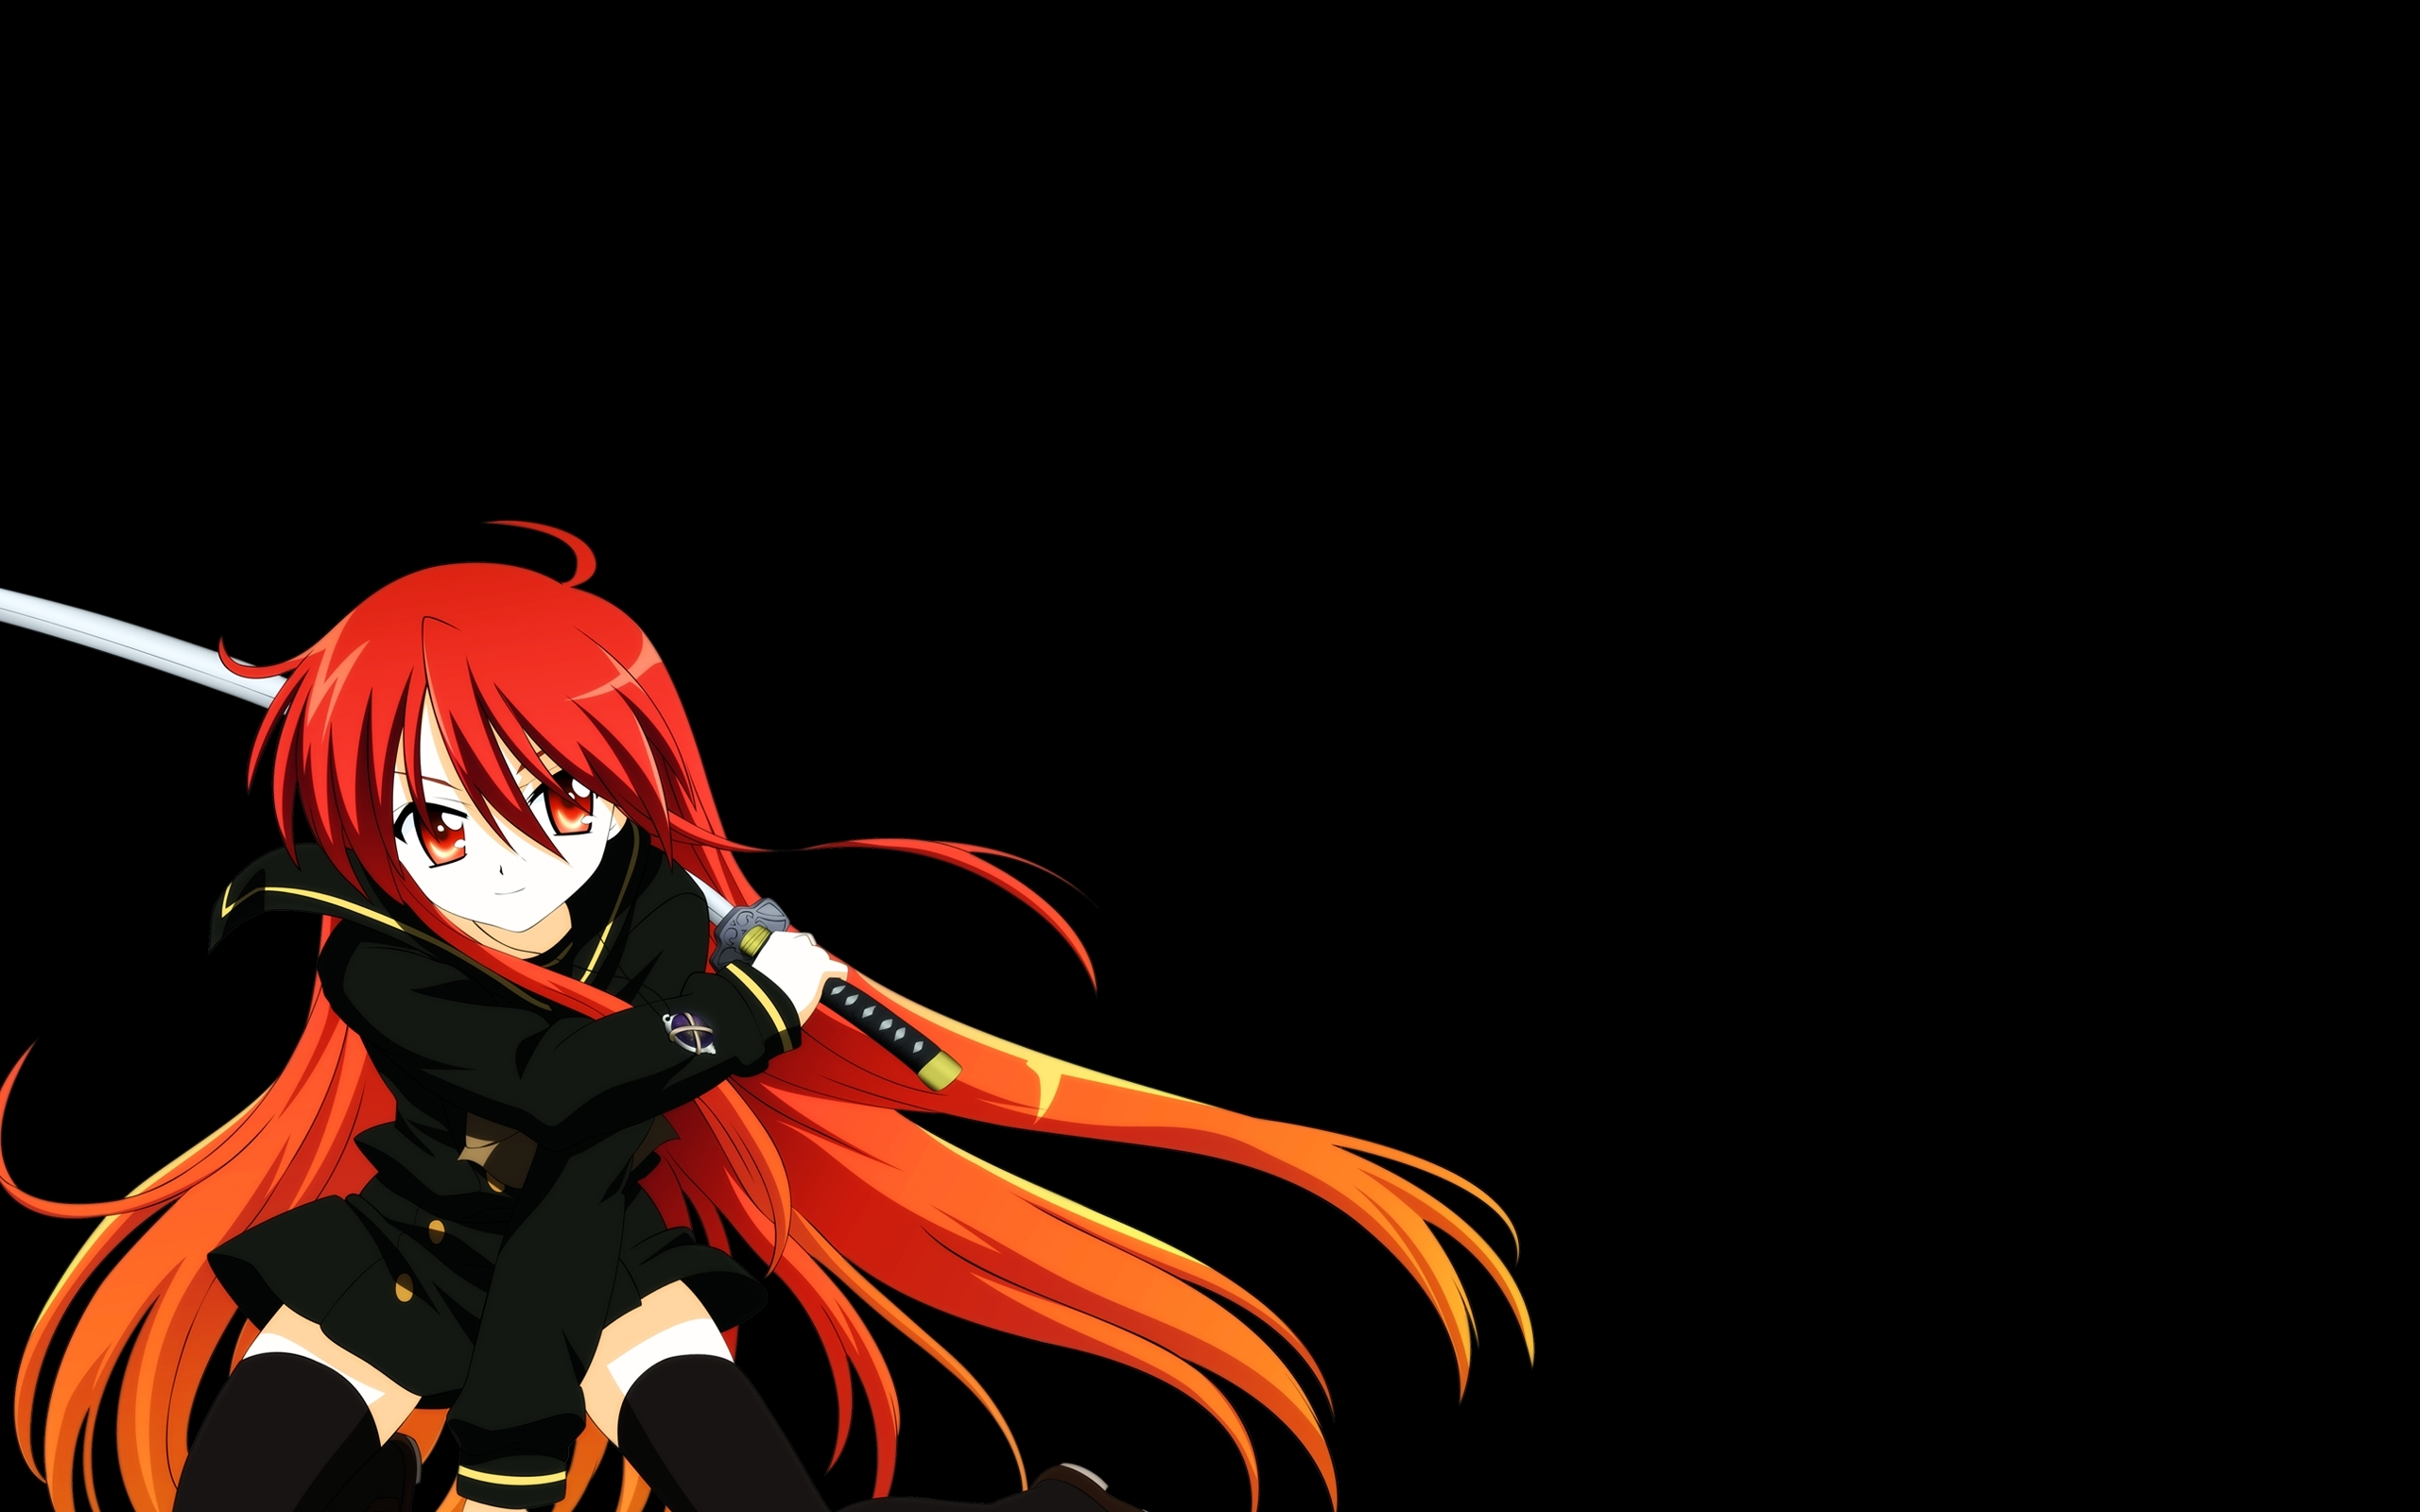 Sword Art Online 720p 720p Wallpaper 1080p 17732 Hd 2560x1600